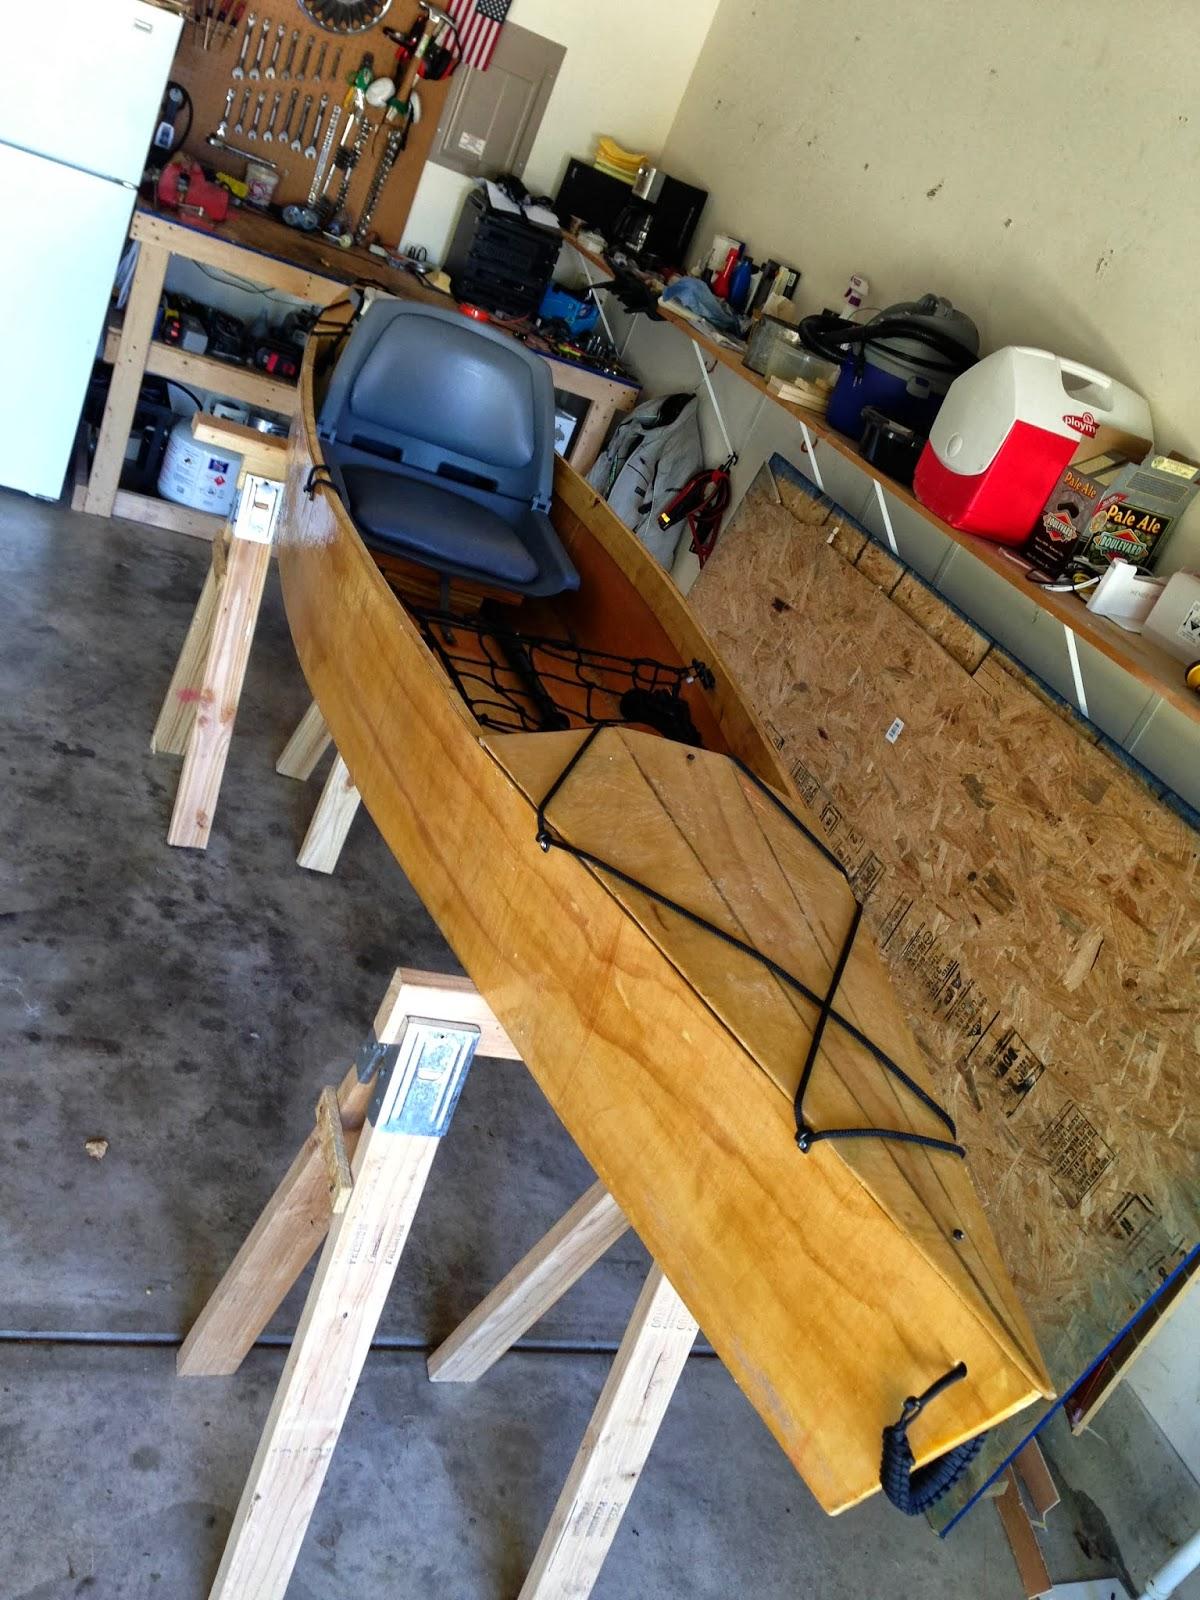 Drew's Projects: Stitch and glue kayak